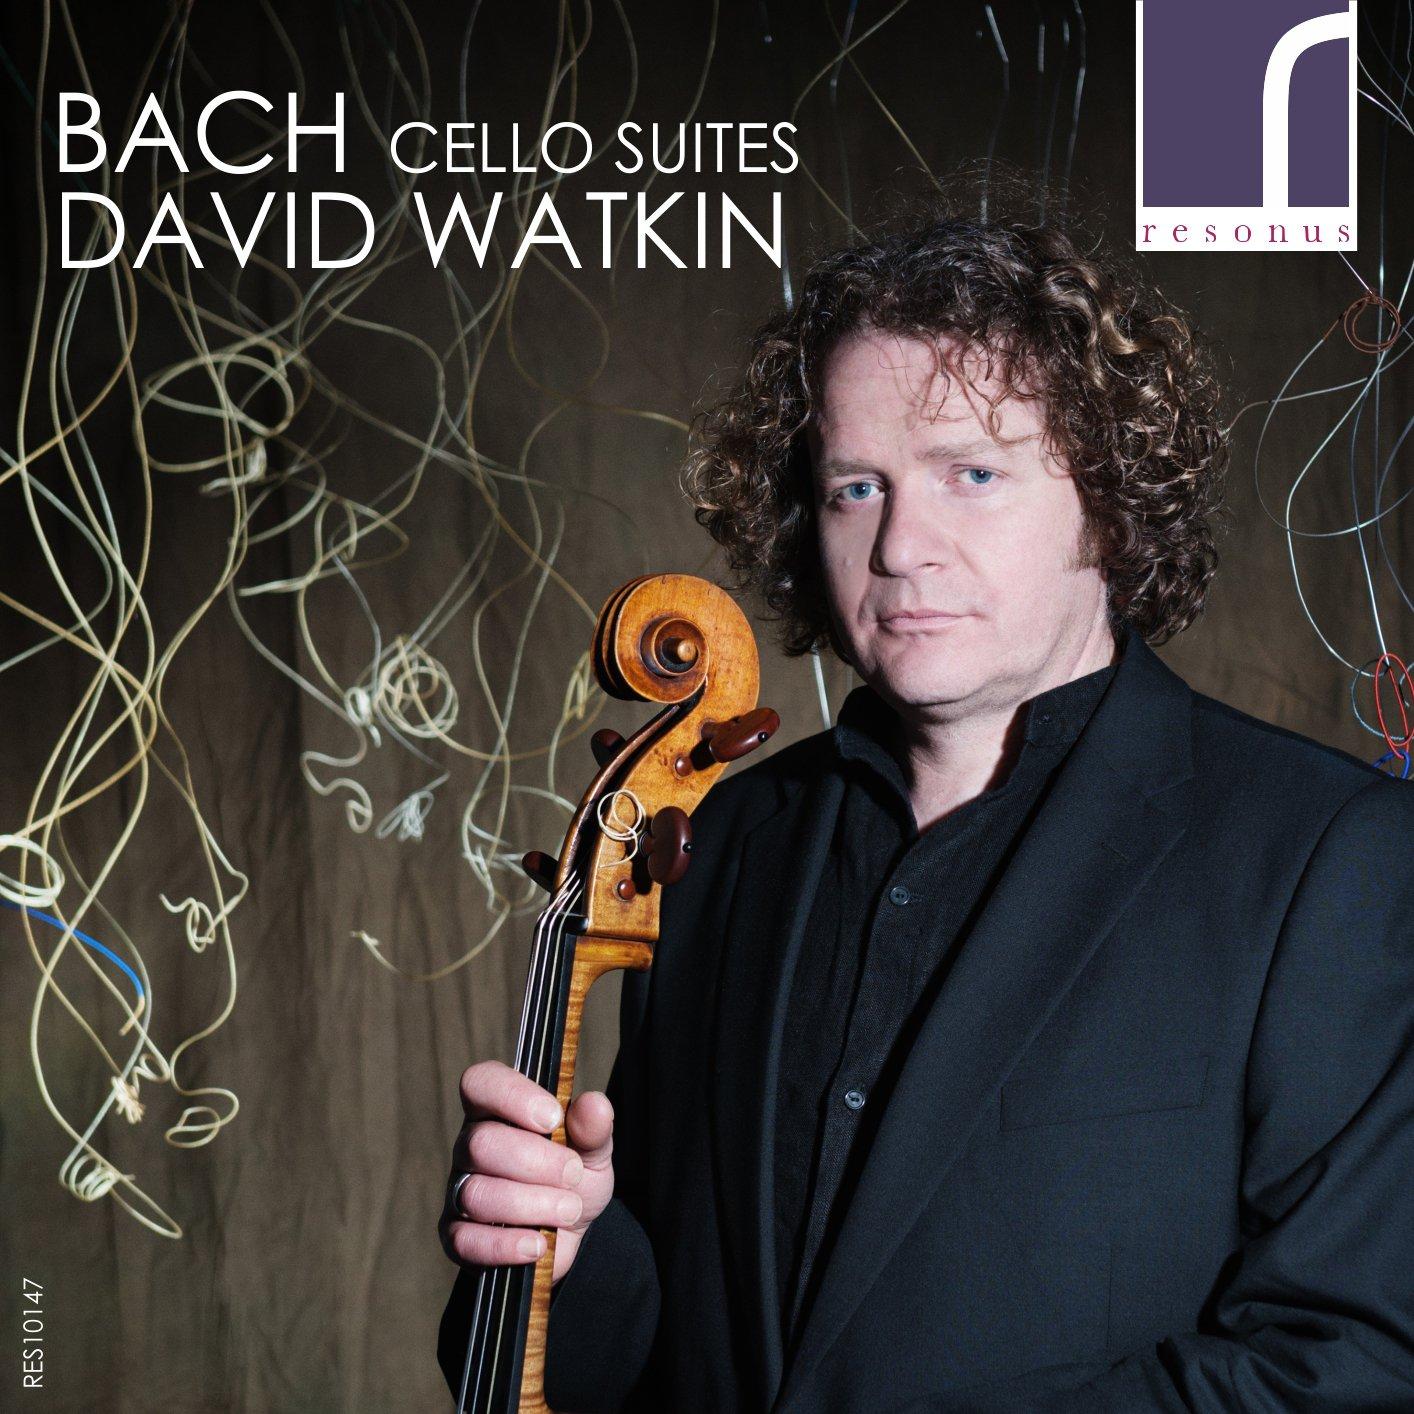 David Watkins Bach Cello Suites